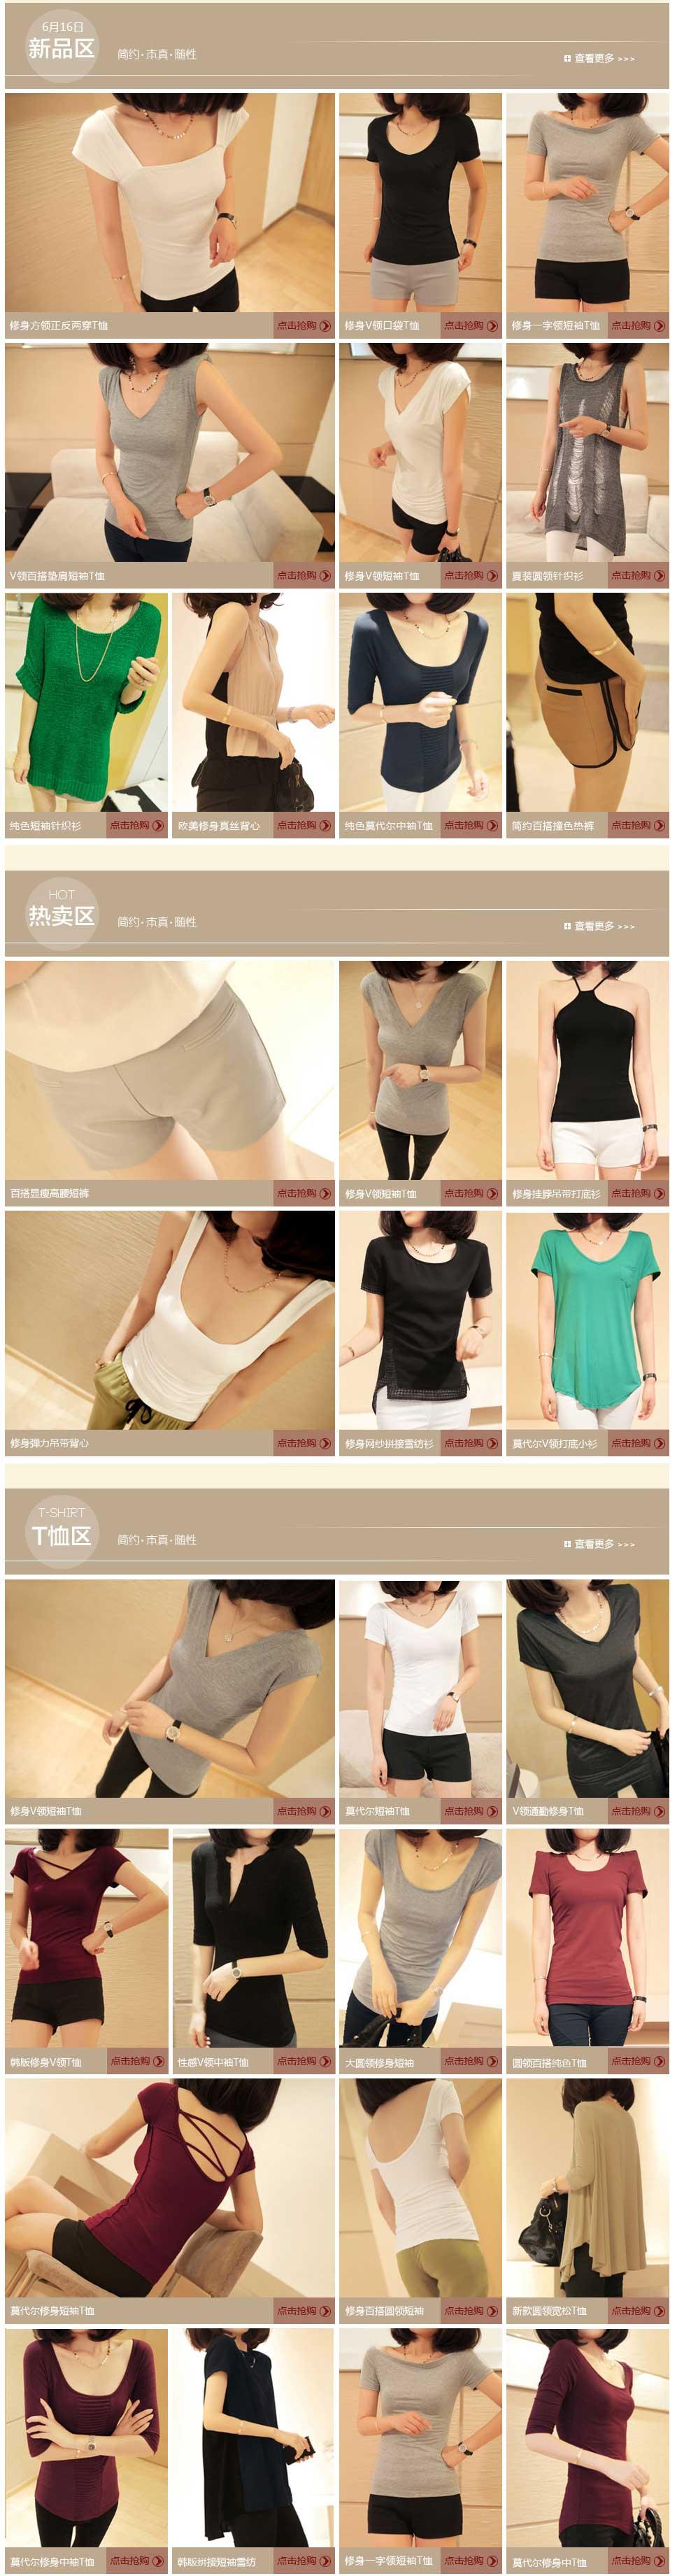 SJP简约女装原创设计品牌